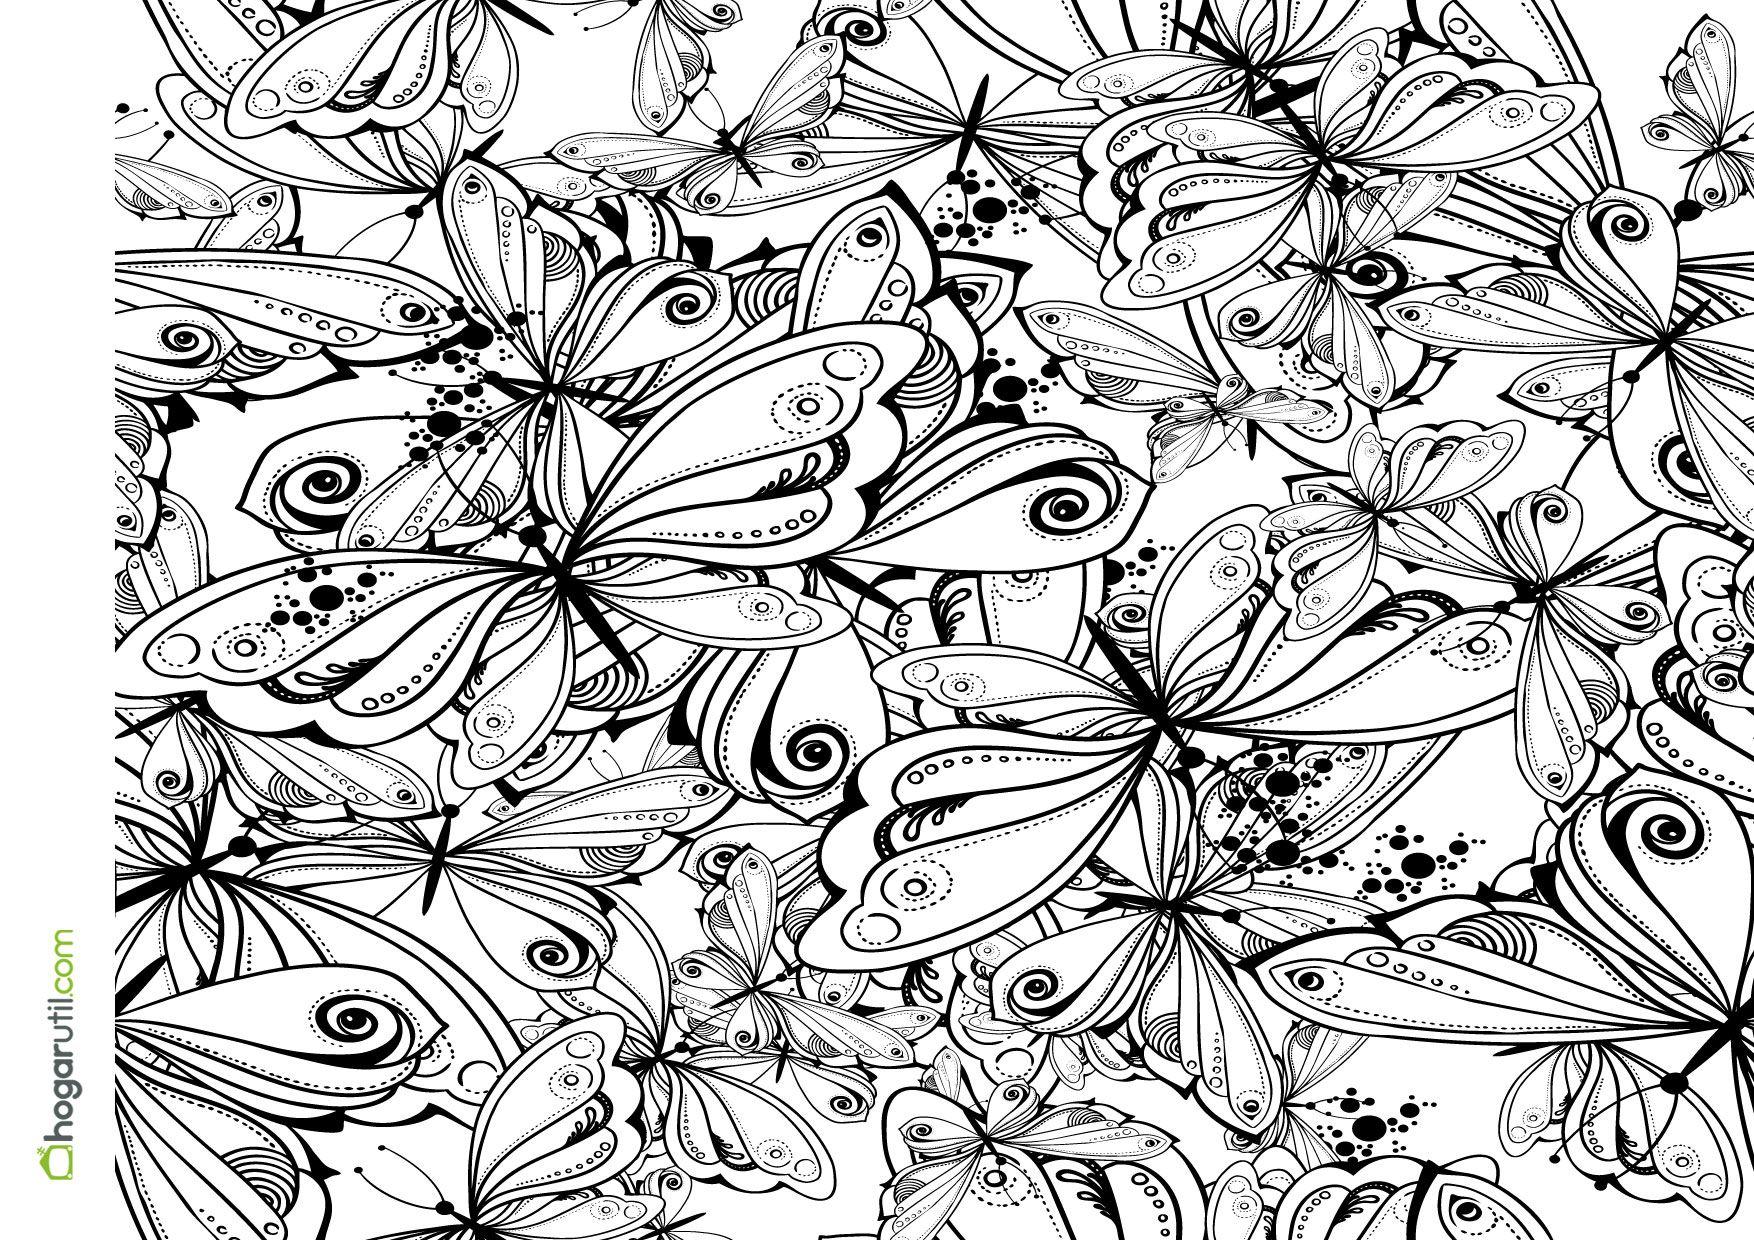 colorear-adultos-06.jpg (1754×1240)   Coloring Pages   Pinterest ...